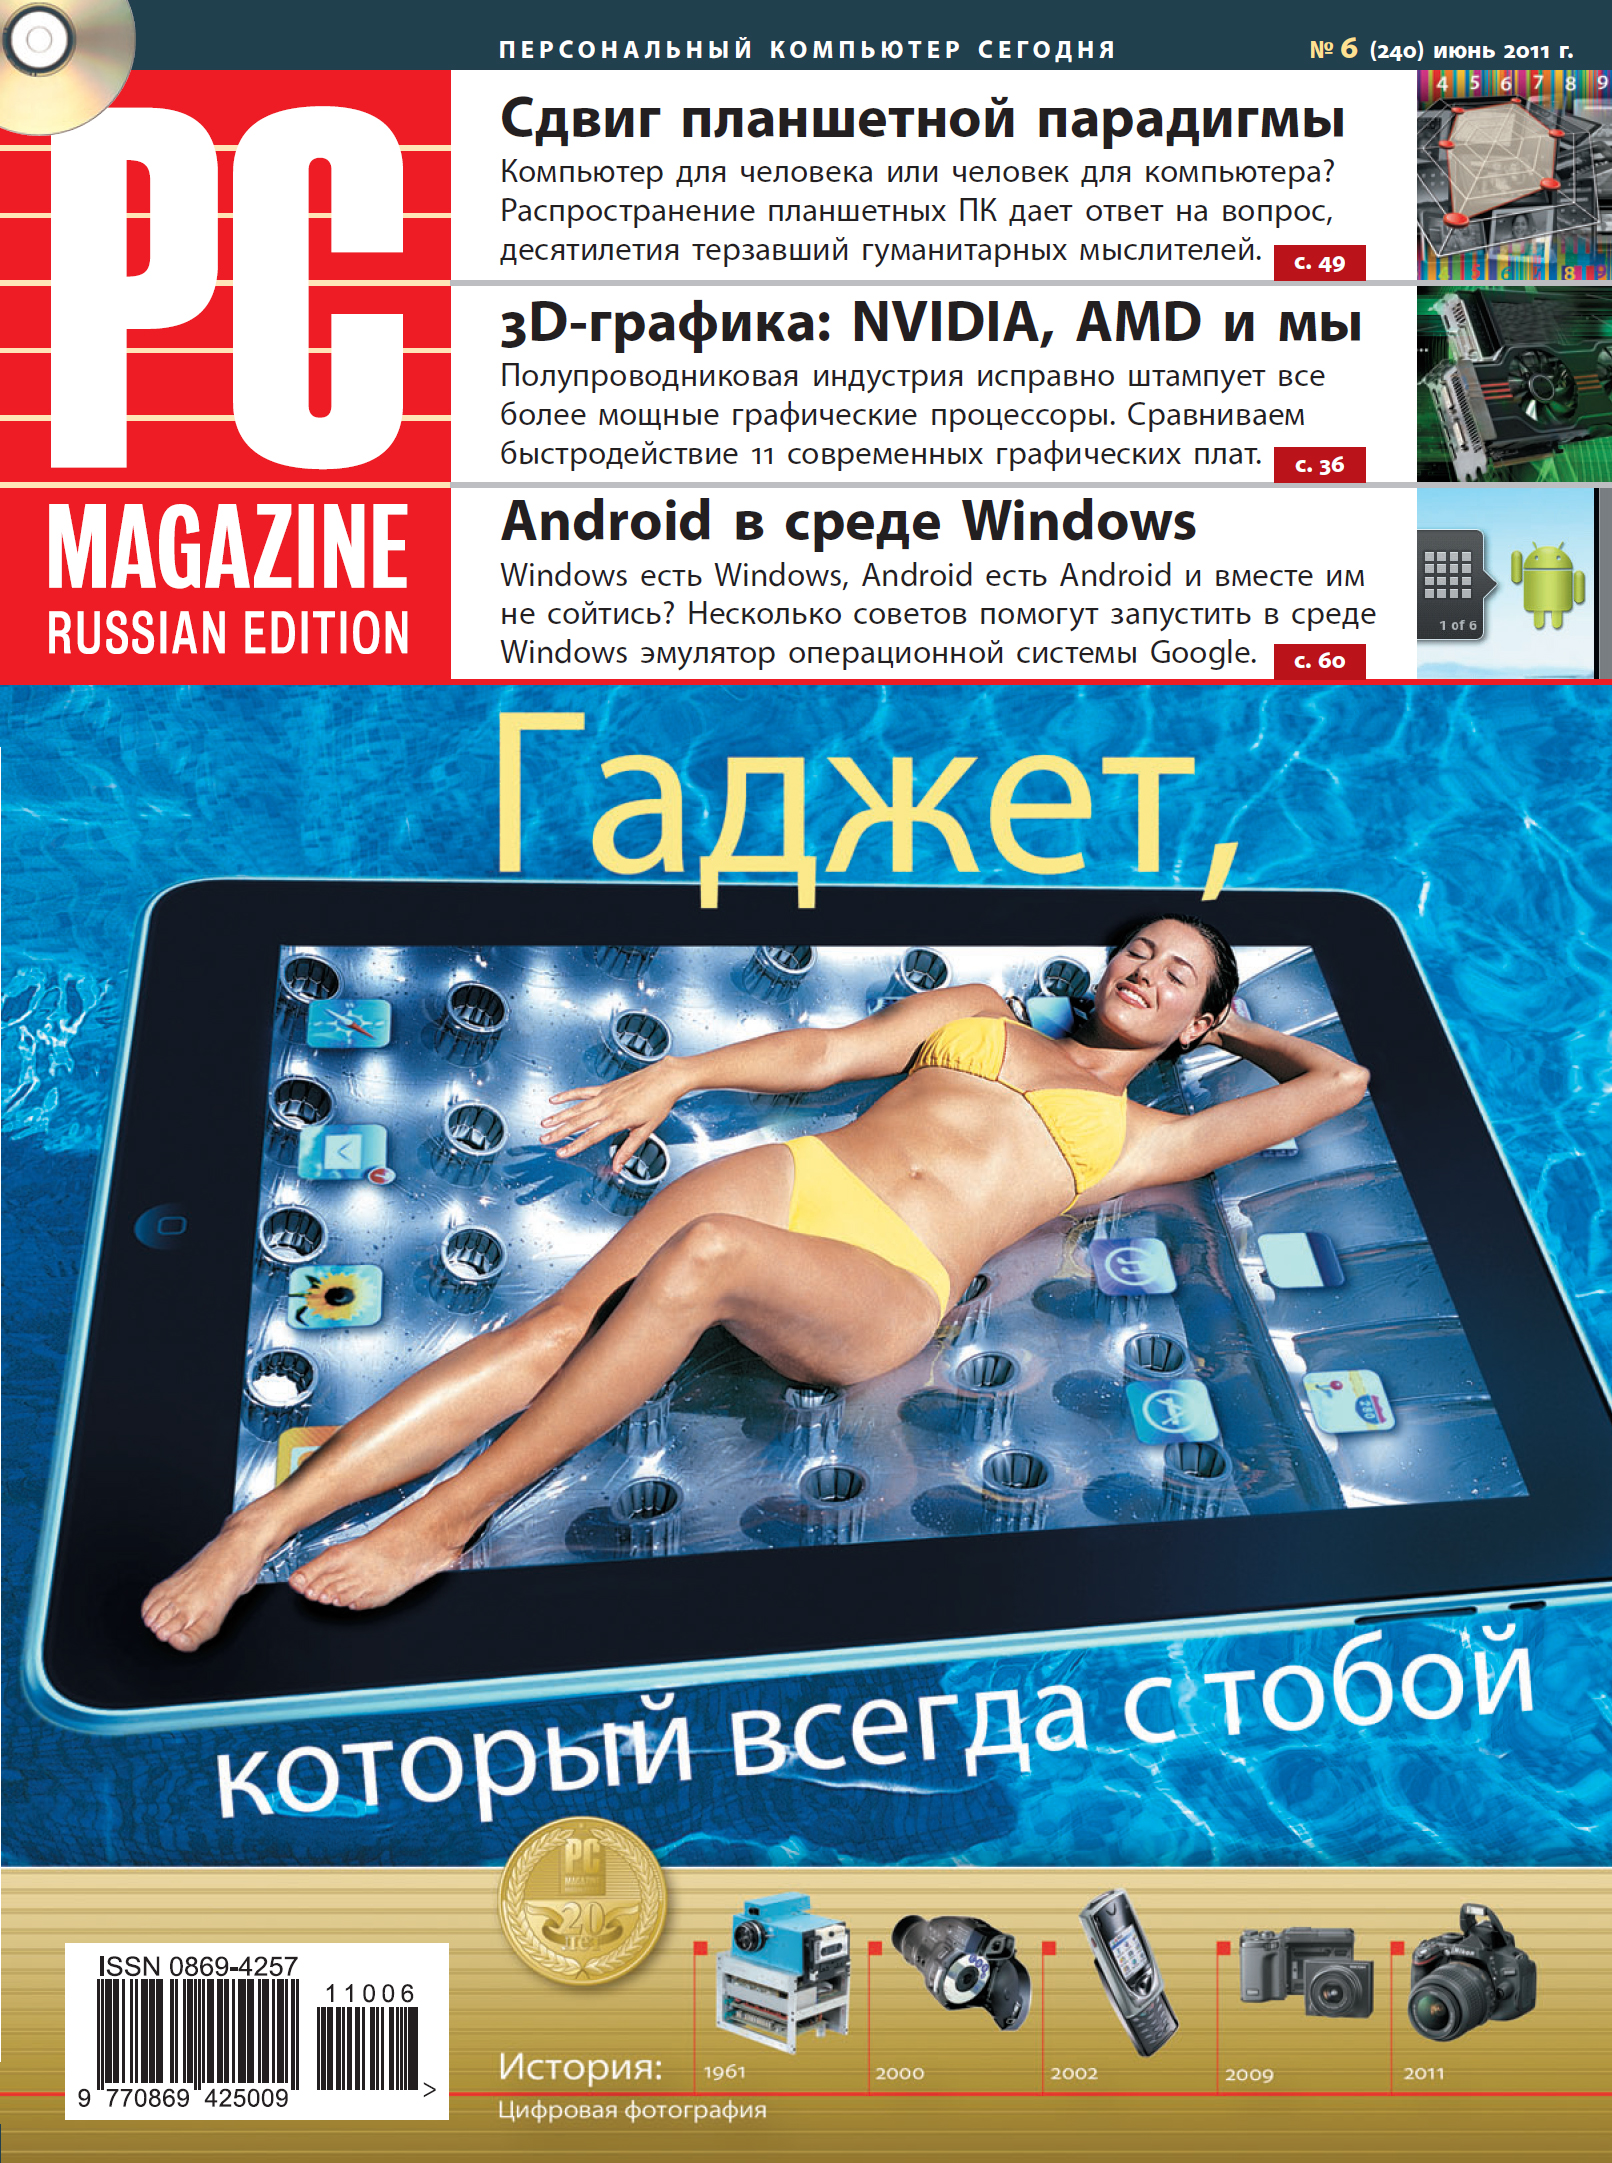 Журнал PC Magazine\/RE №6\/2011